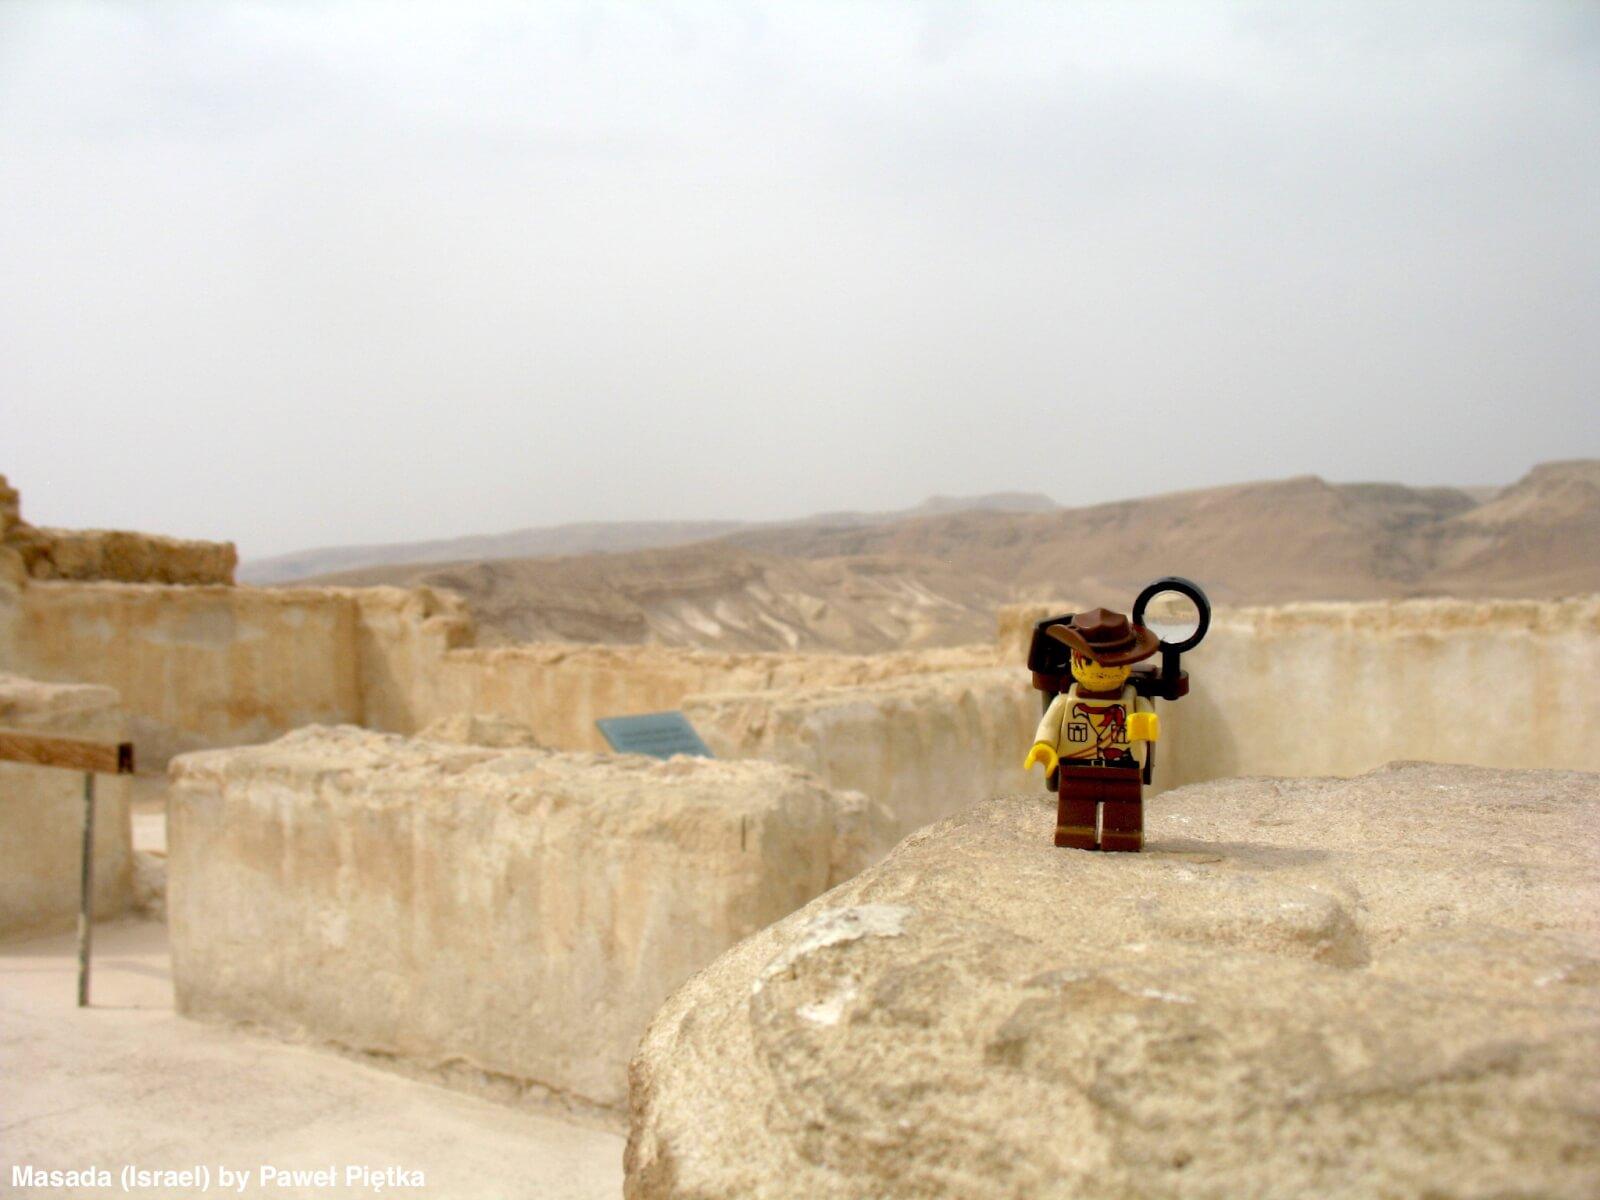 Masada (Israel) - Fortress 2